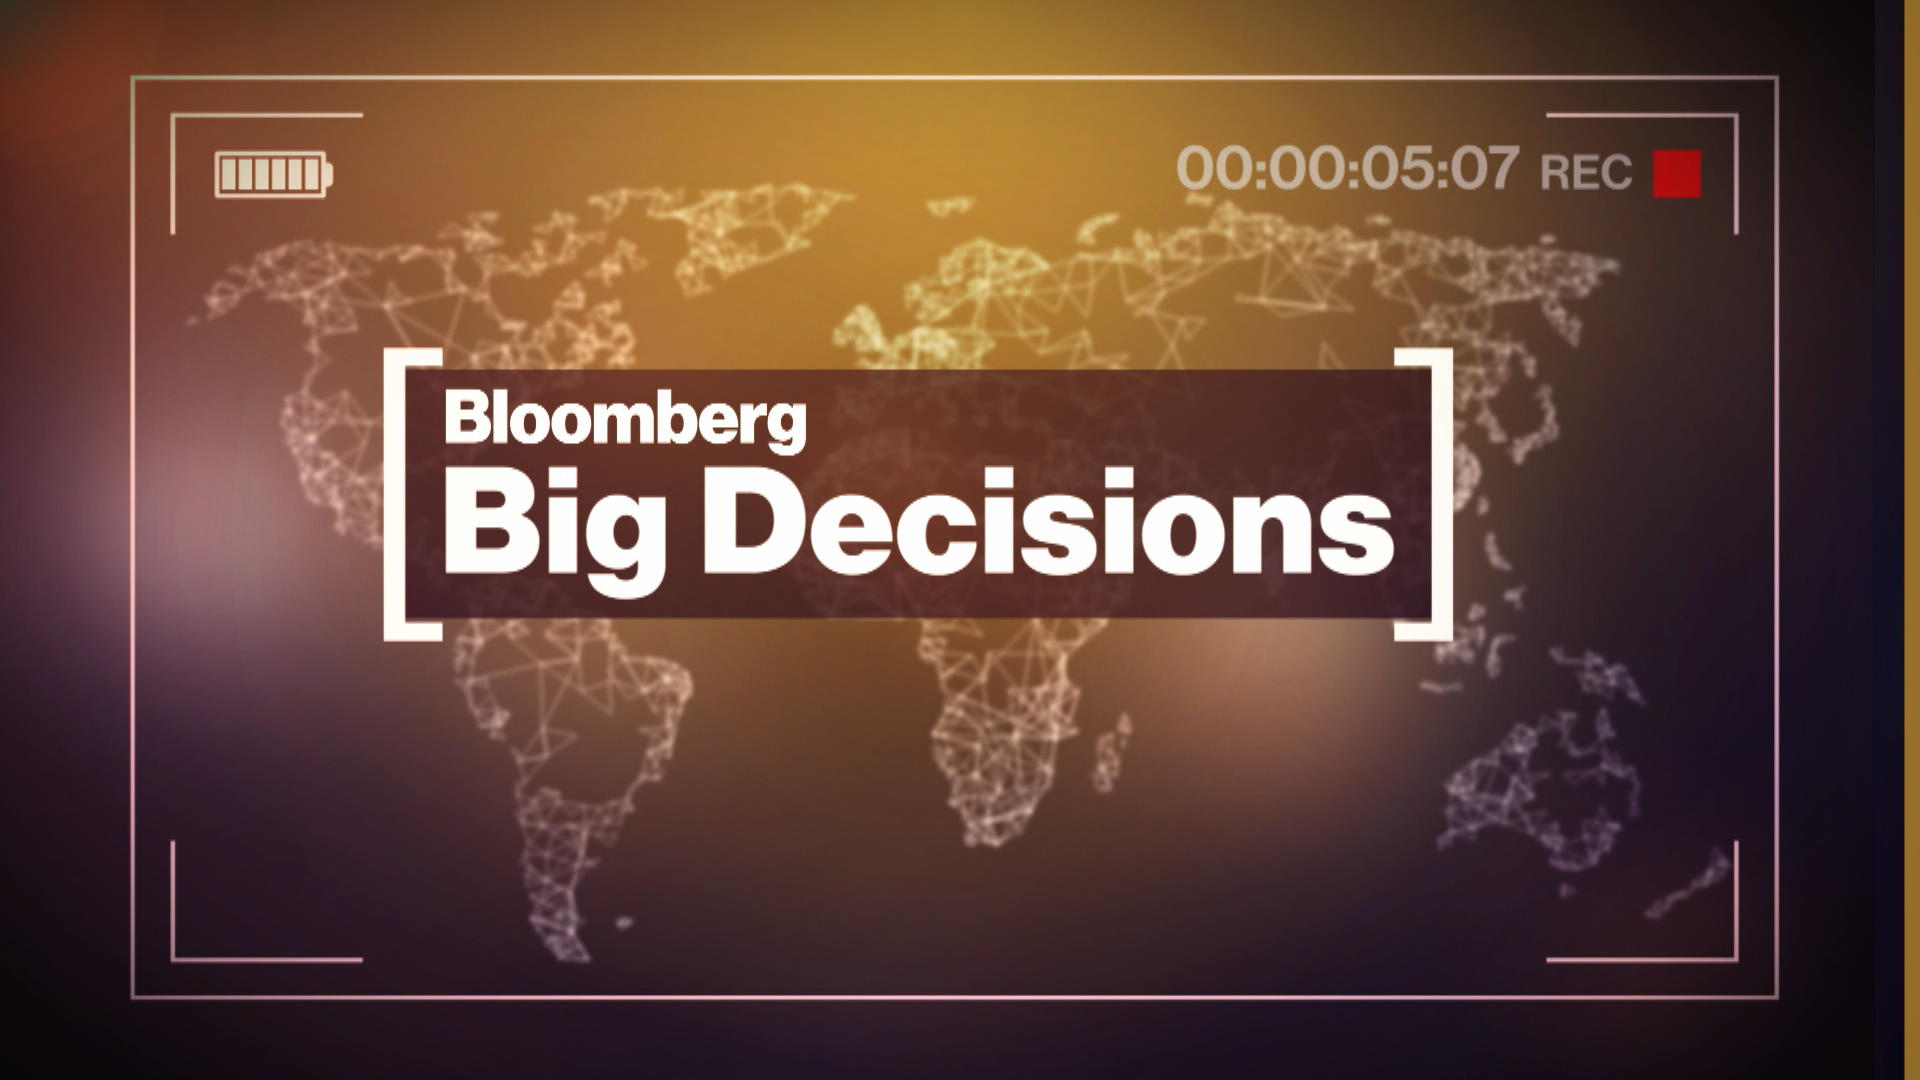 'Bloomberg Big Decisions' - Richard Thaler